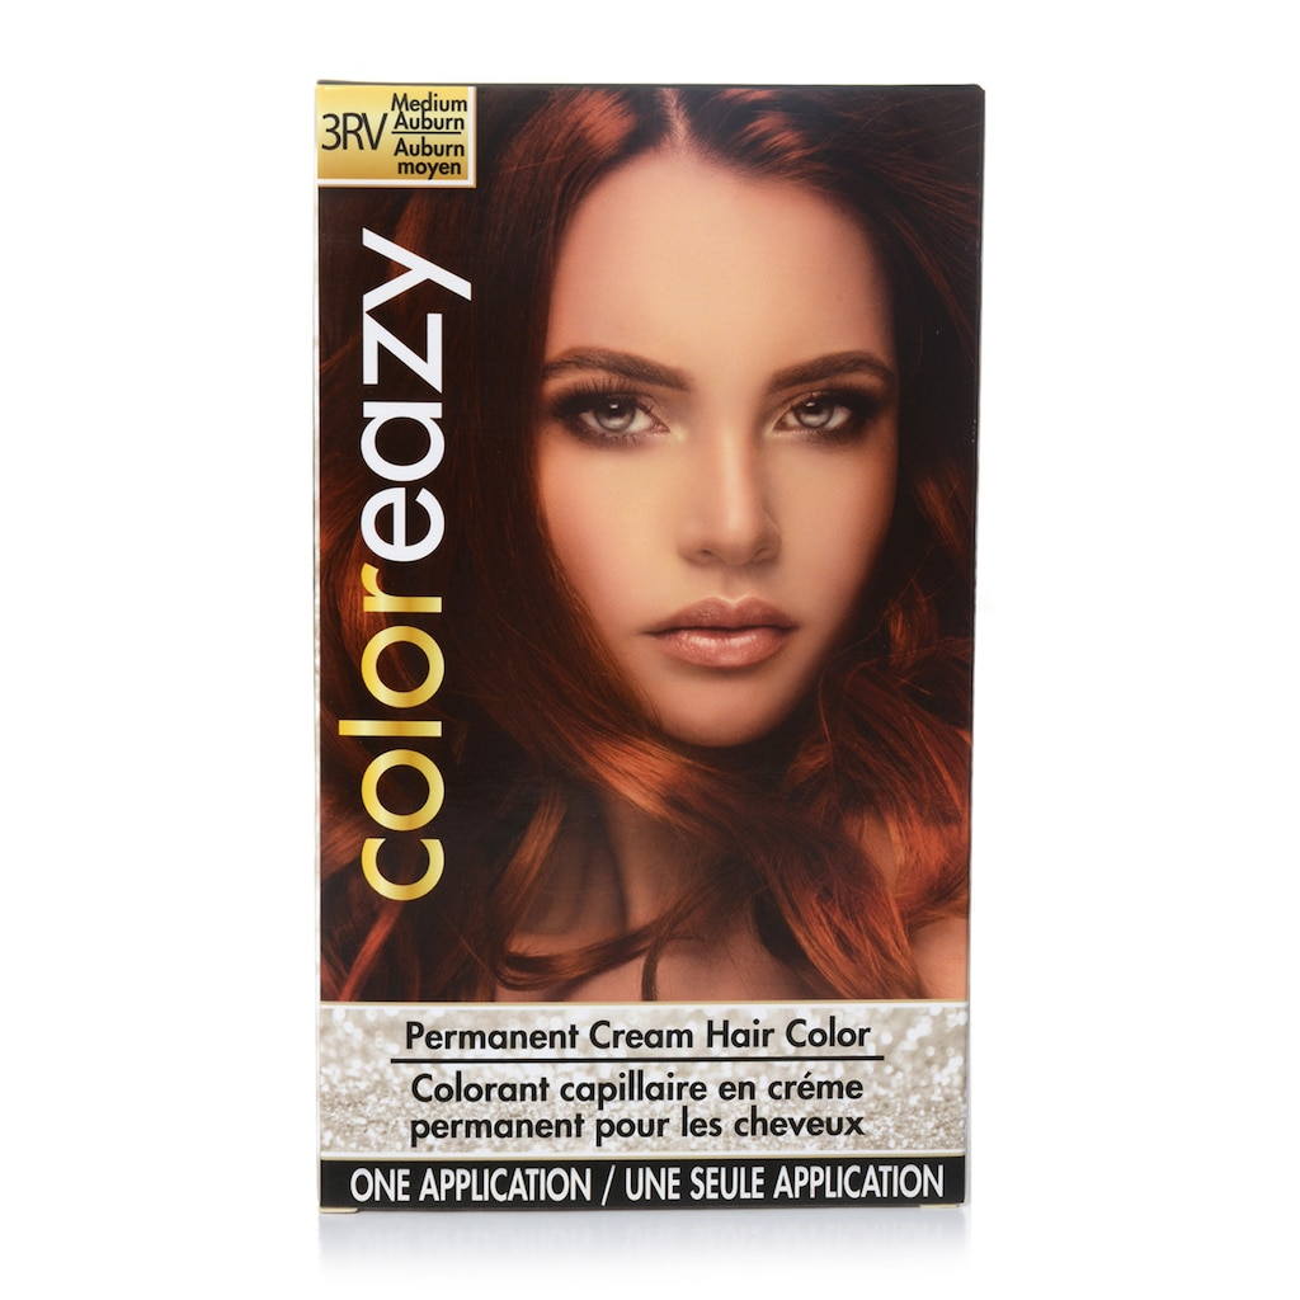 ColorEazy Women\'s Medium Auburn Hair Color